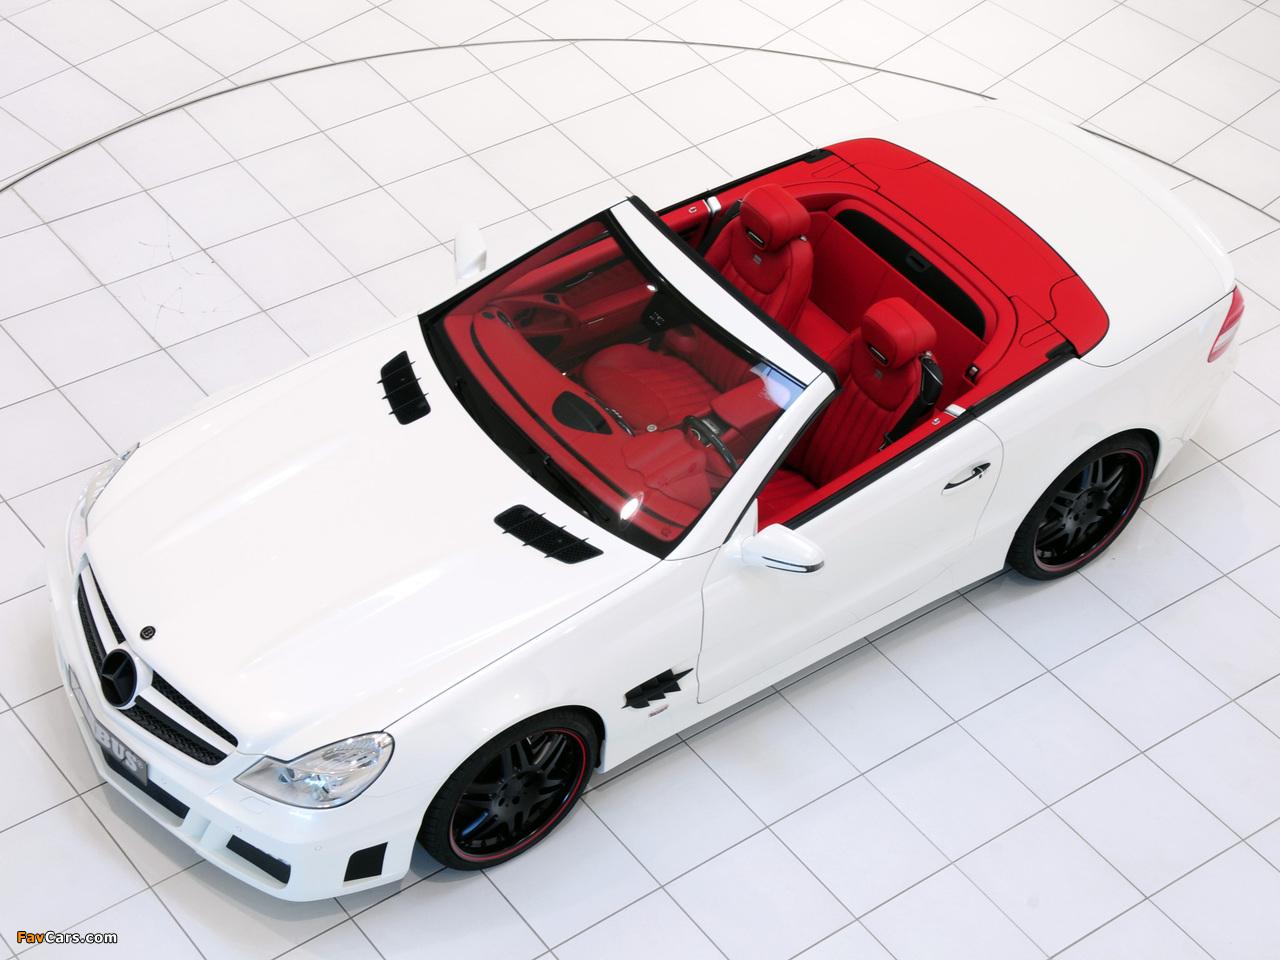 Brabus S V12 R (R230) 2009 images (1280 x 960)